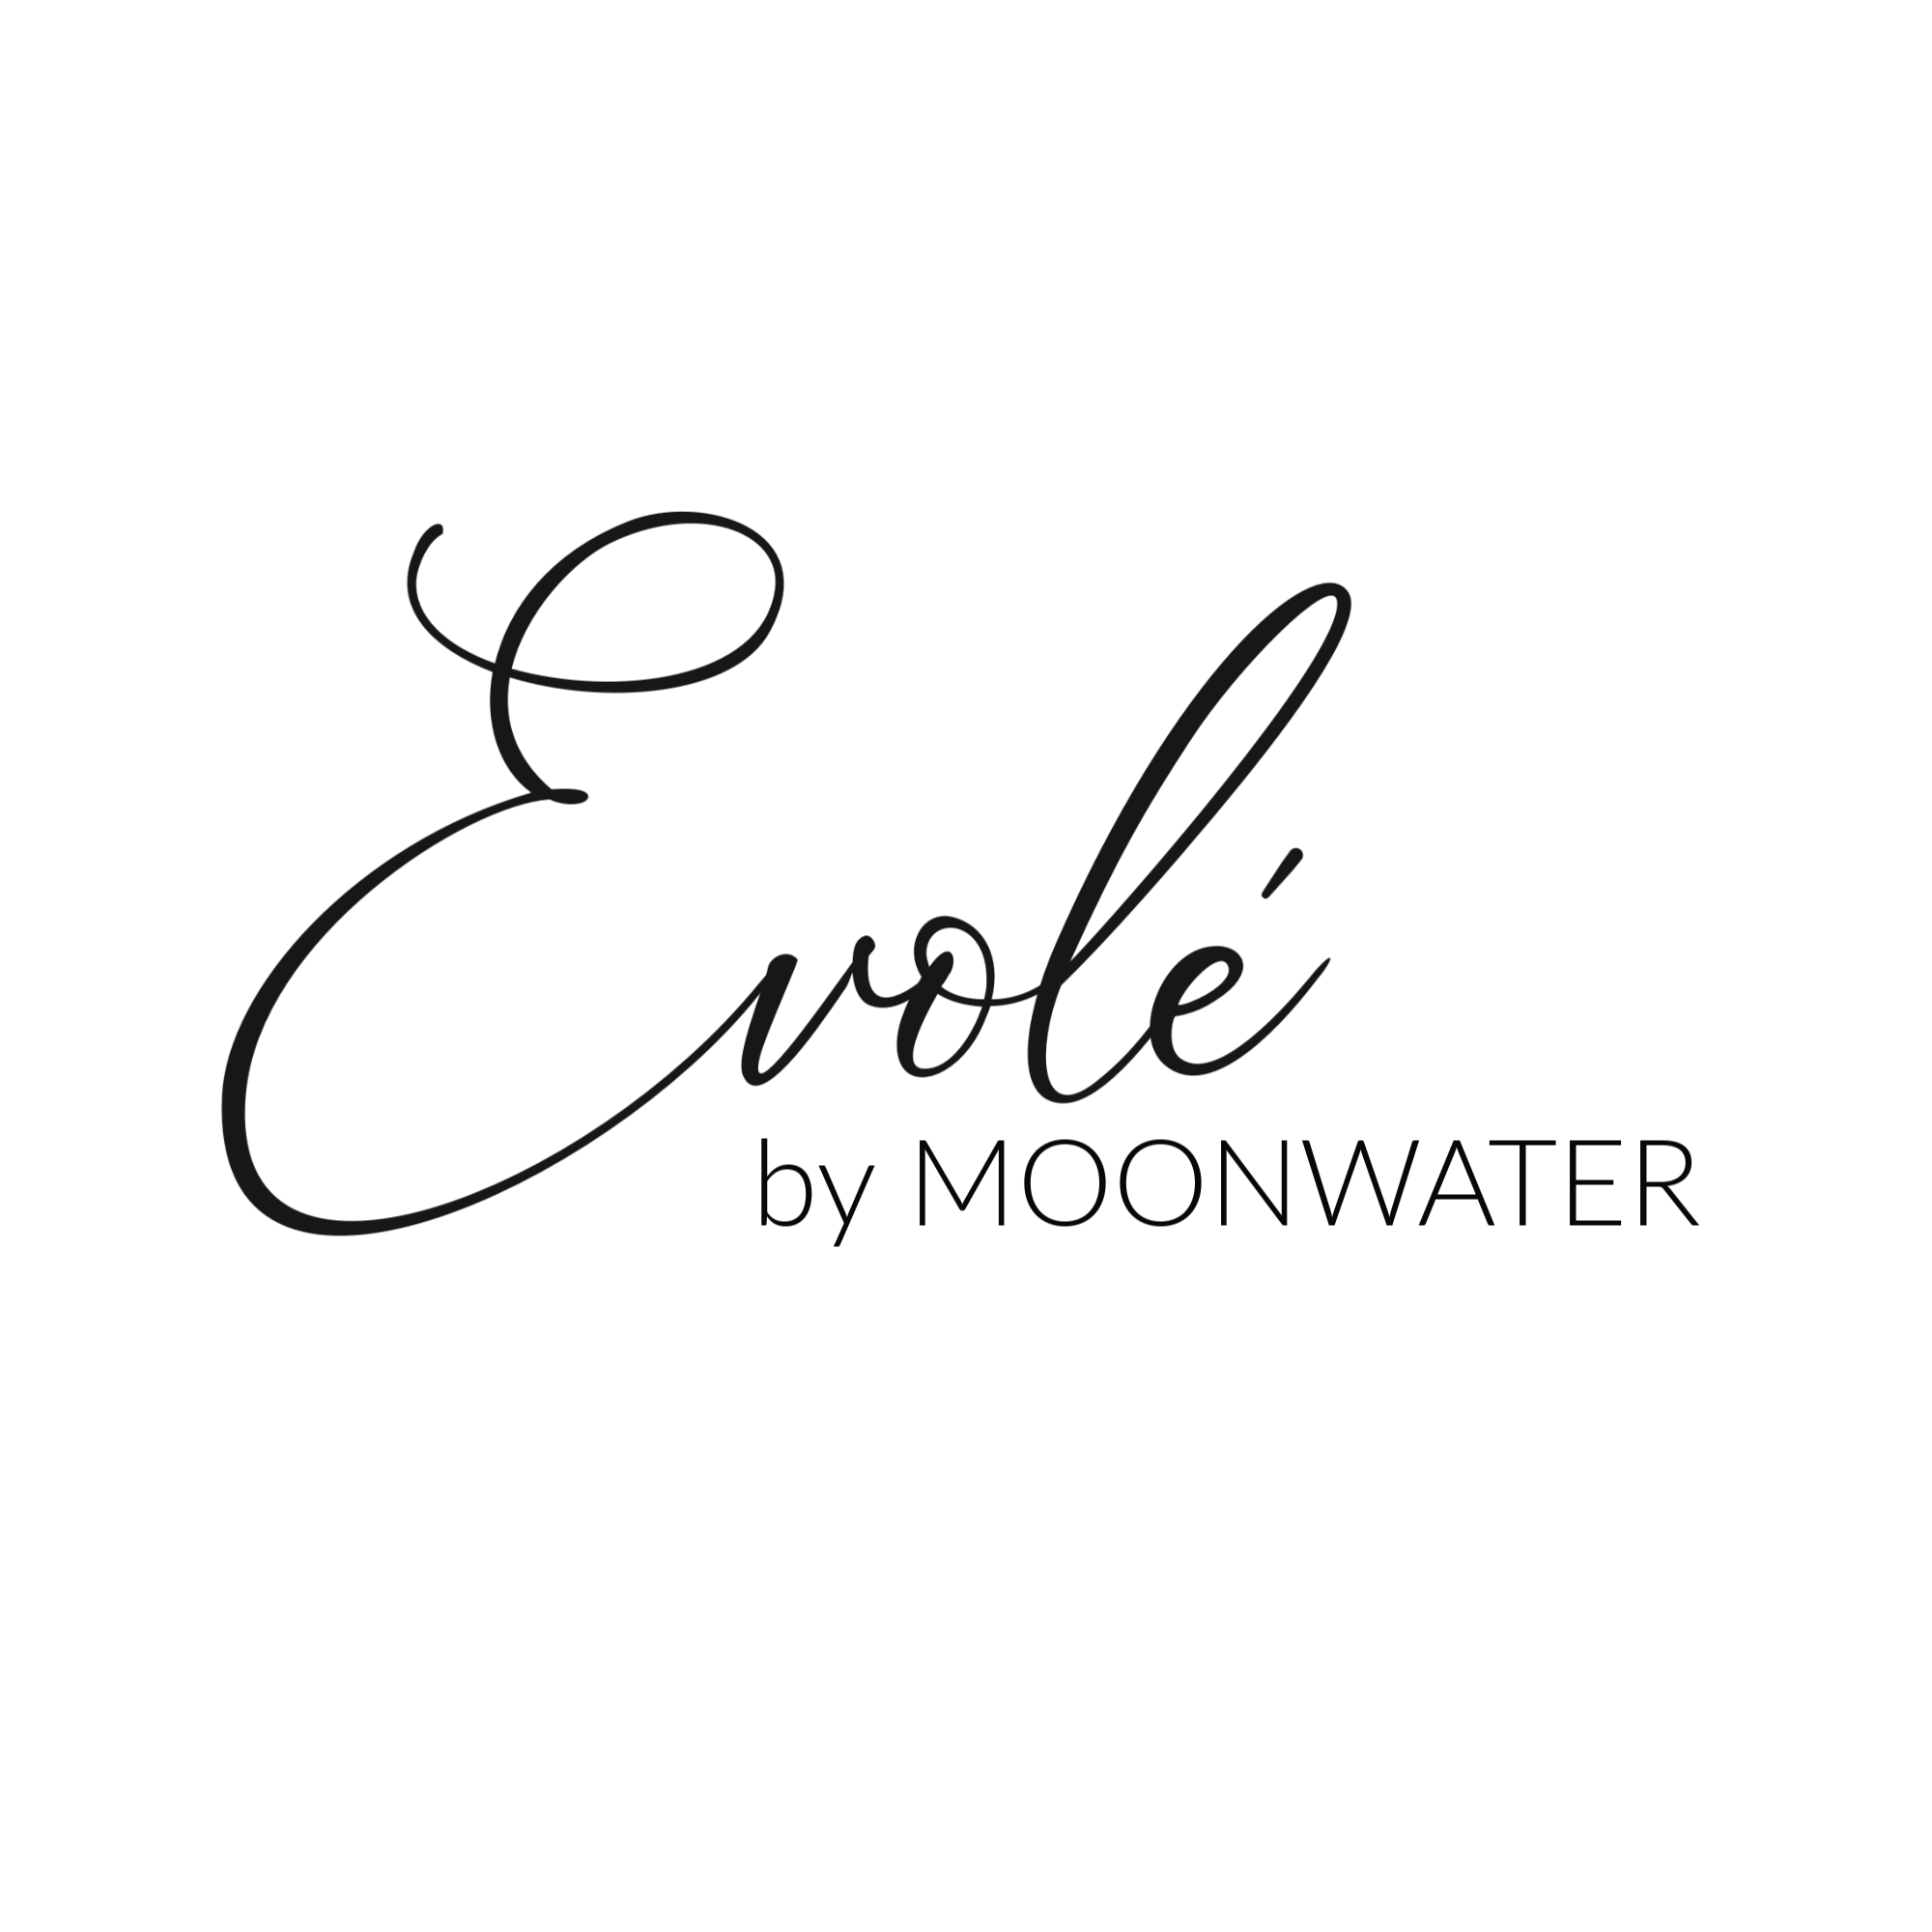 evole'logo.png